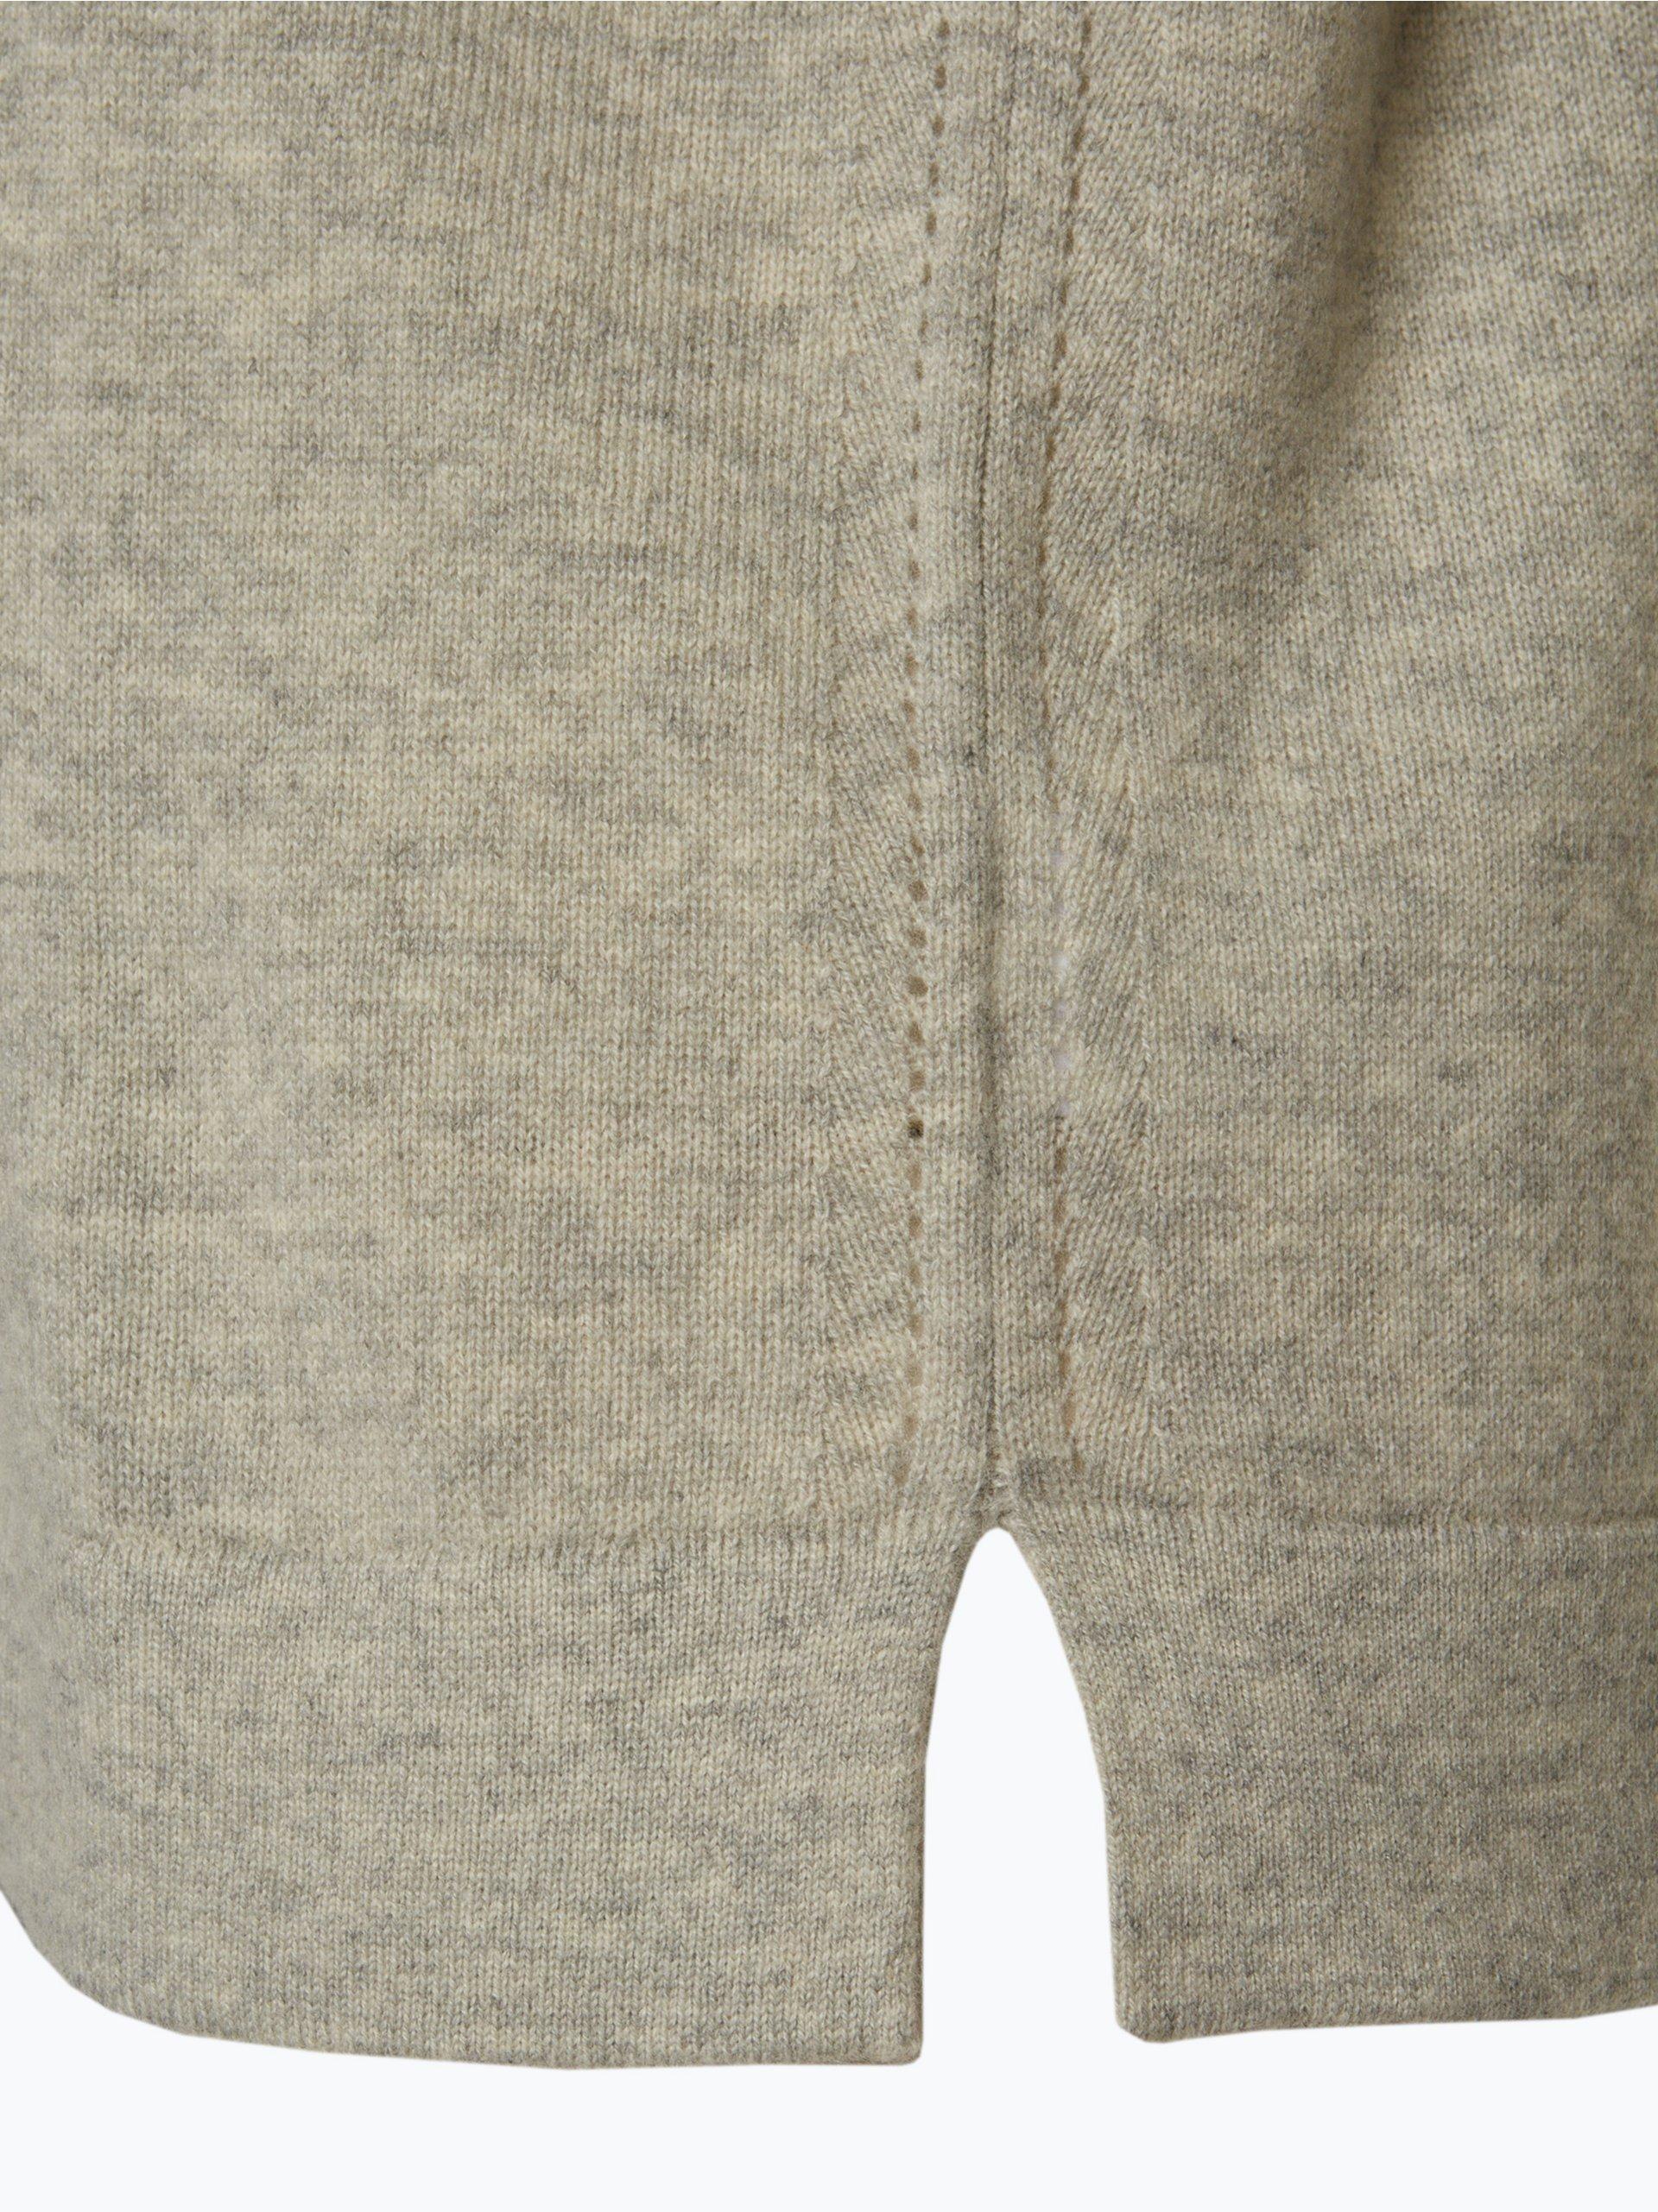 polo ralph lauren damen pure cashmere pullover grau uni. Black Bedroom Furniture Sets. Home Design Ideas